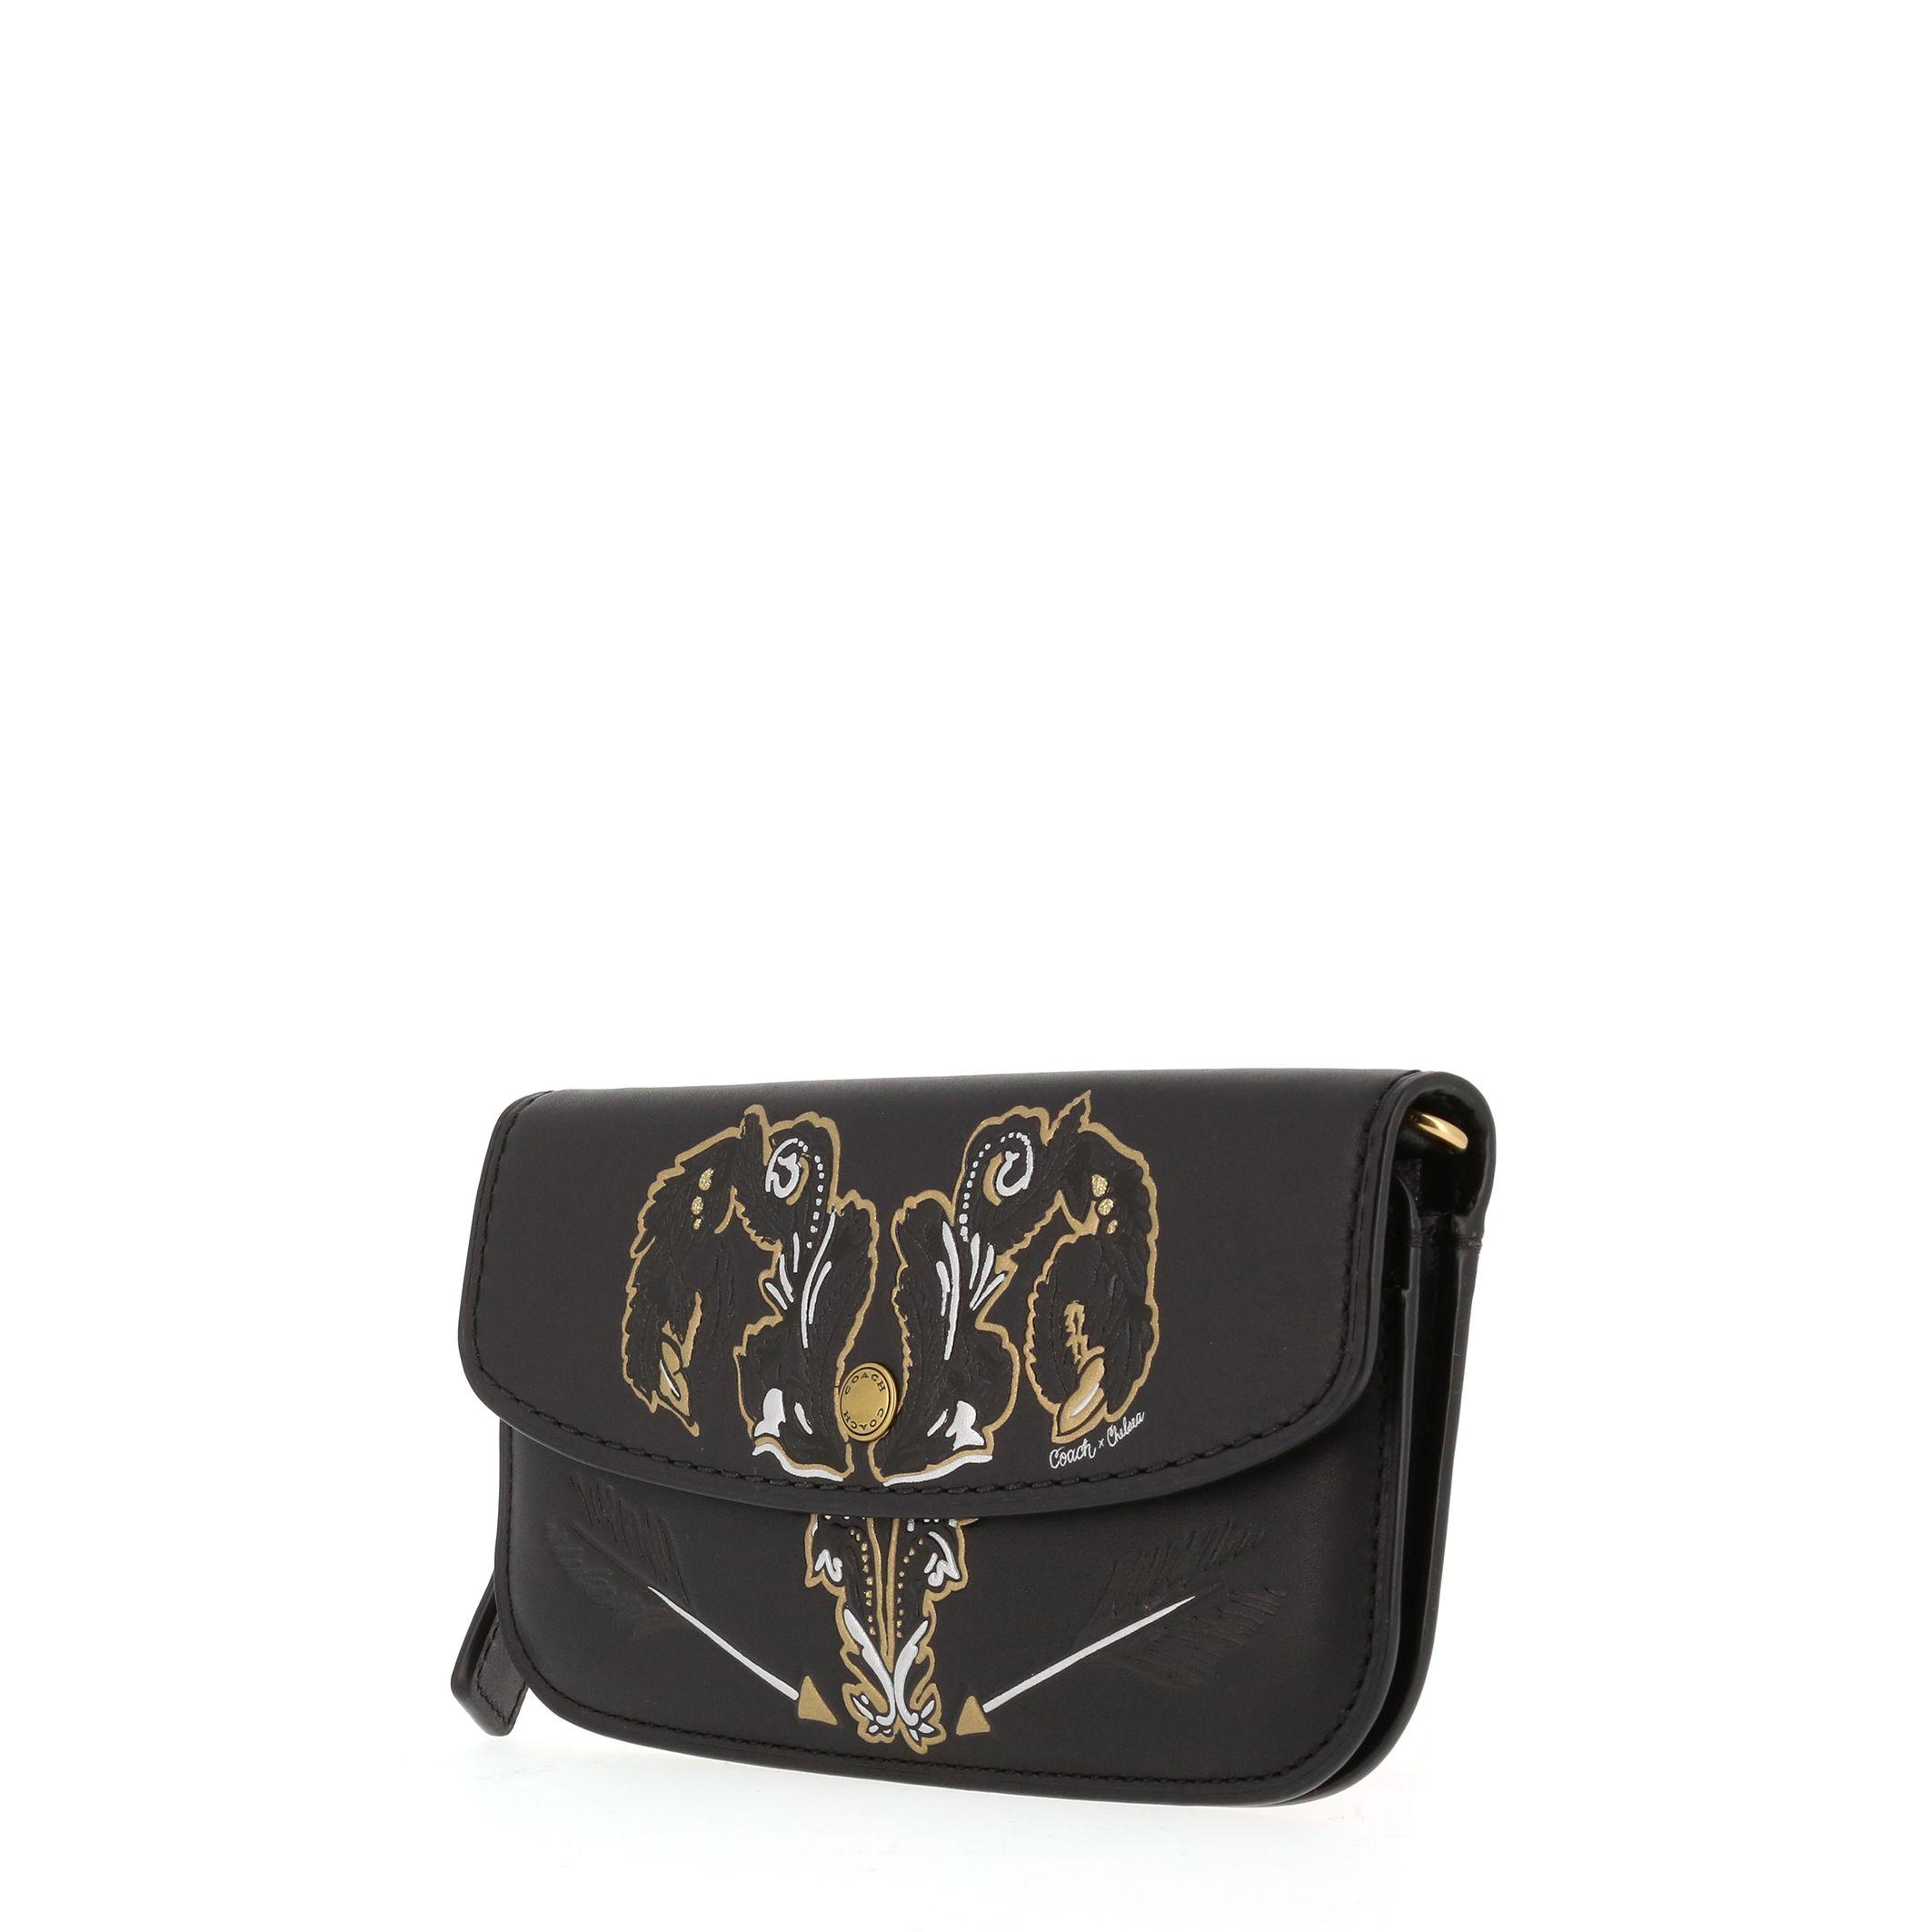 Coach Womens Clutch Bags